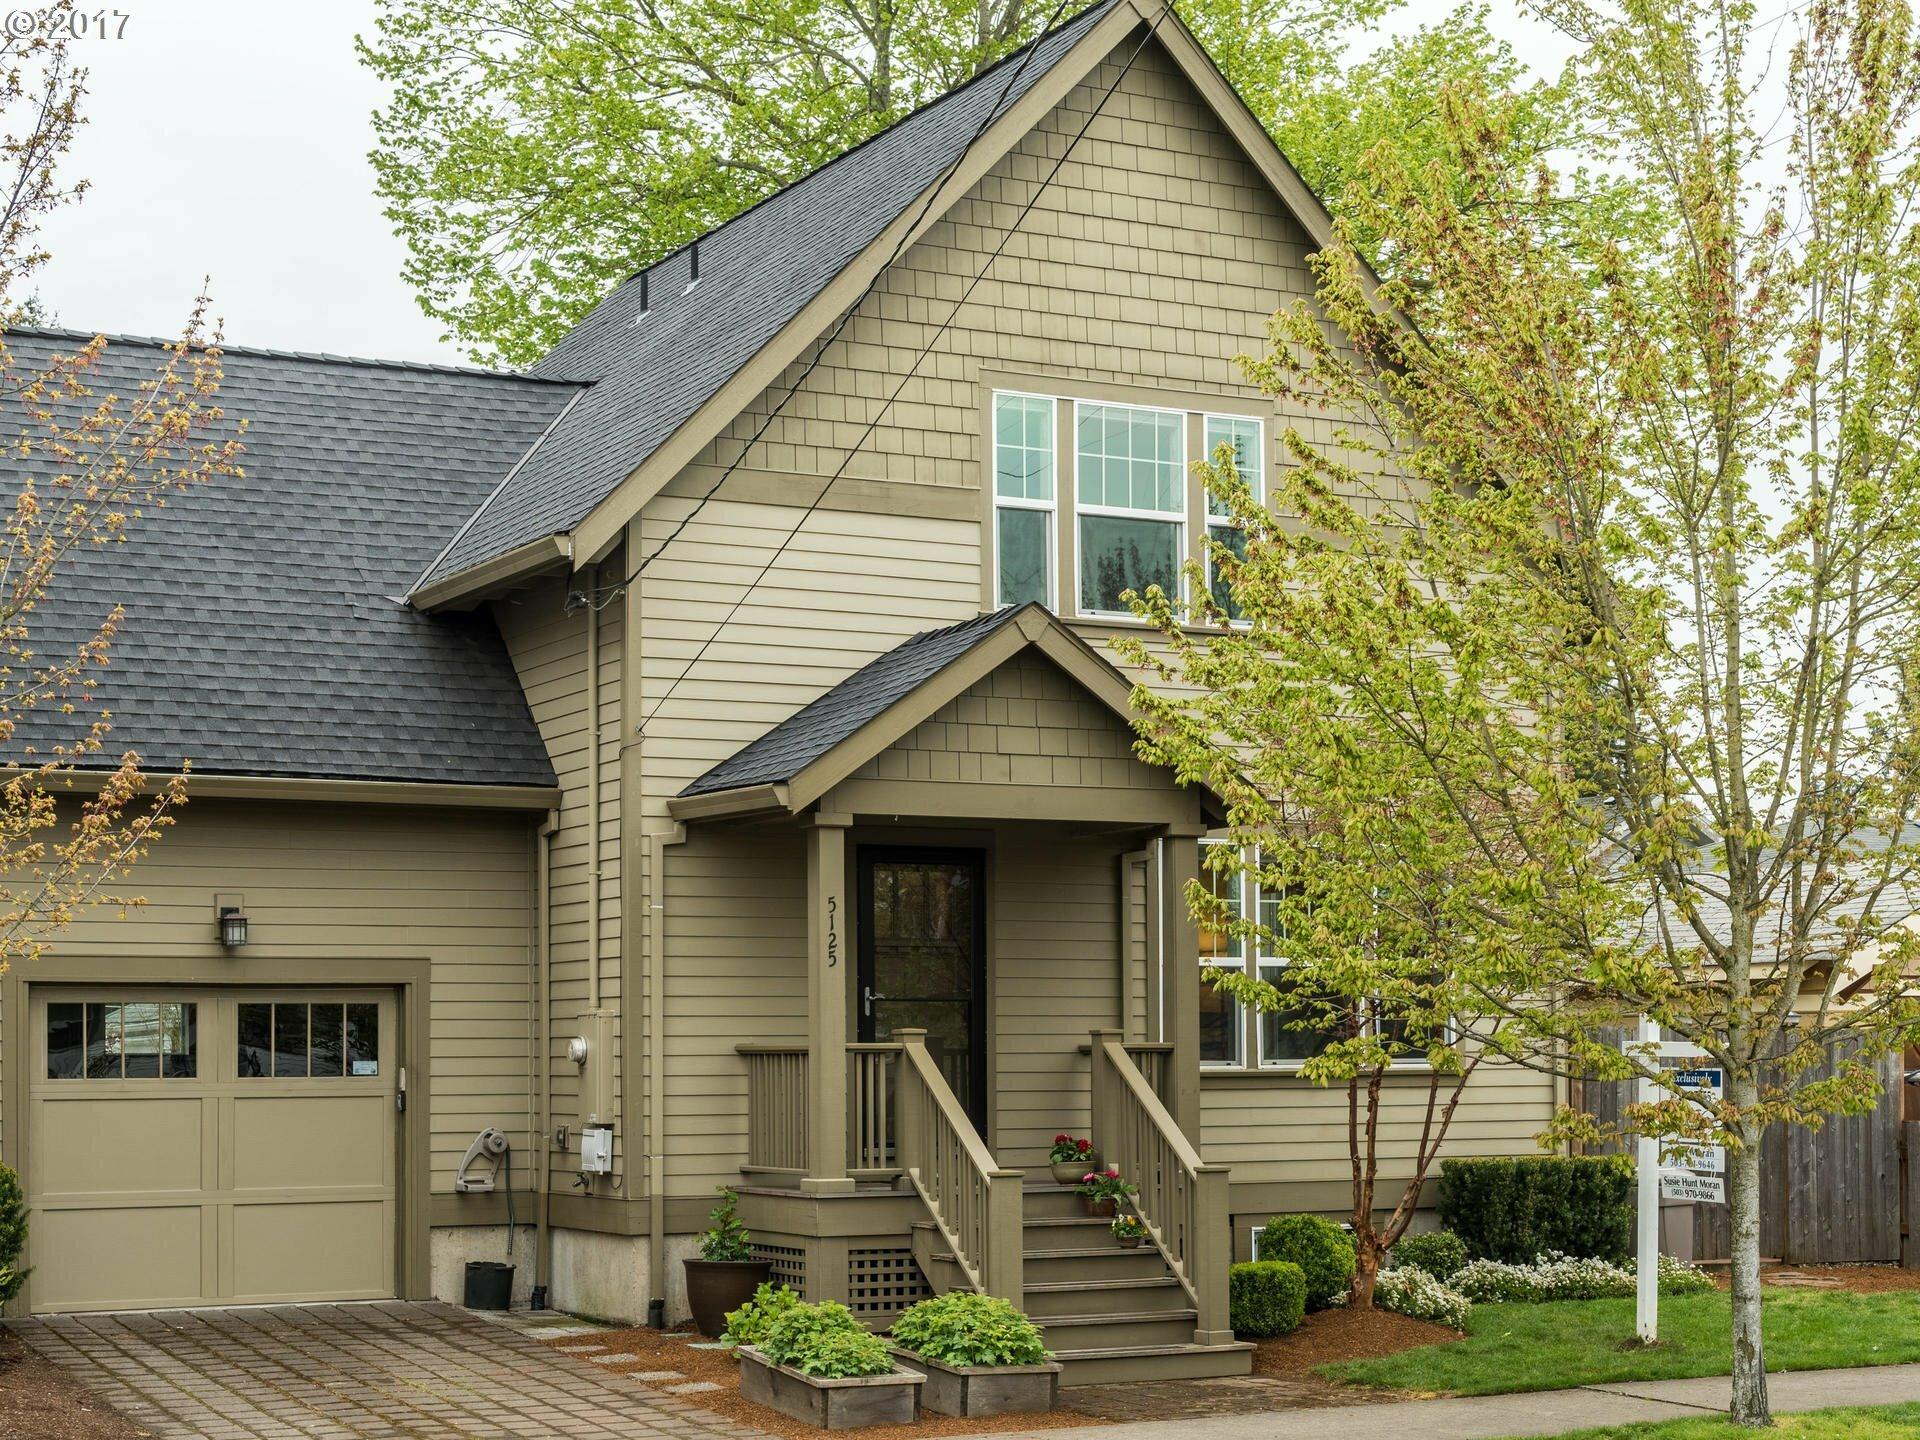 5125 Ne Halsey St, Portland, OR - USA (photo 1)